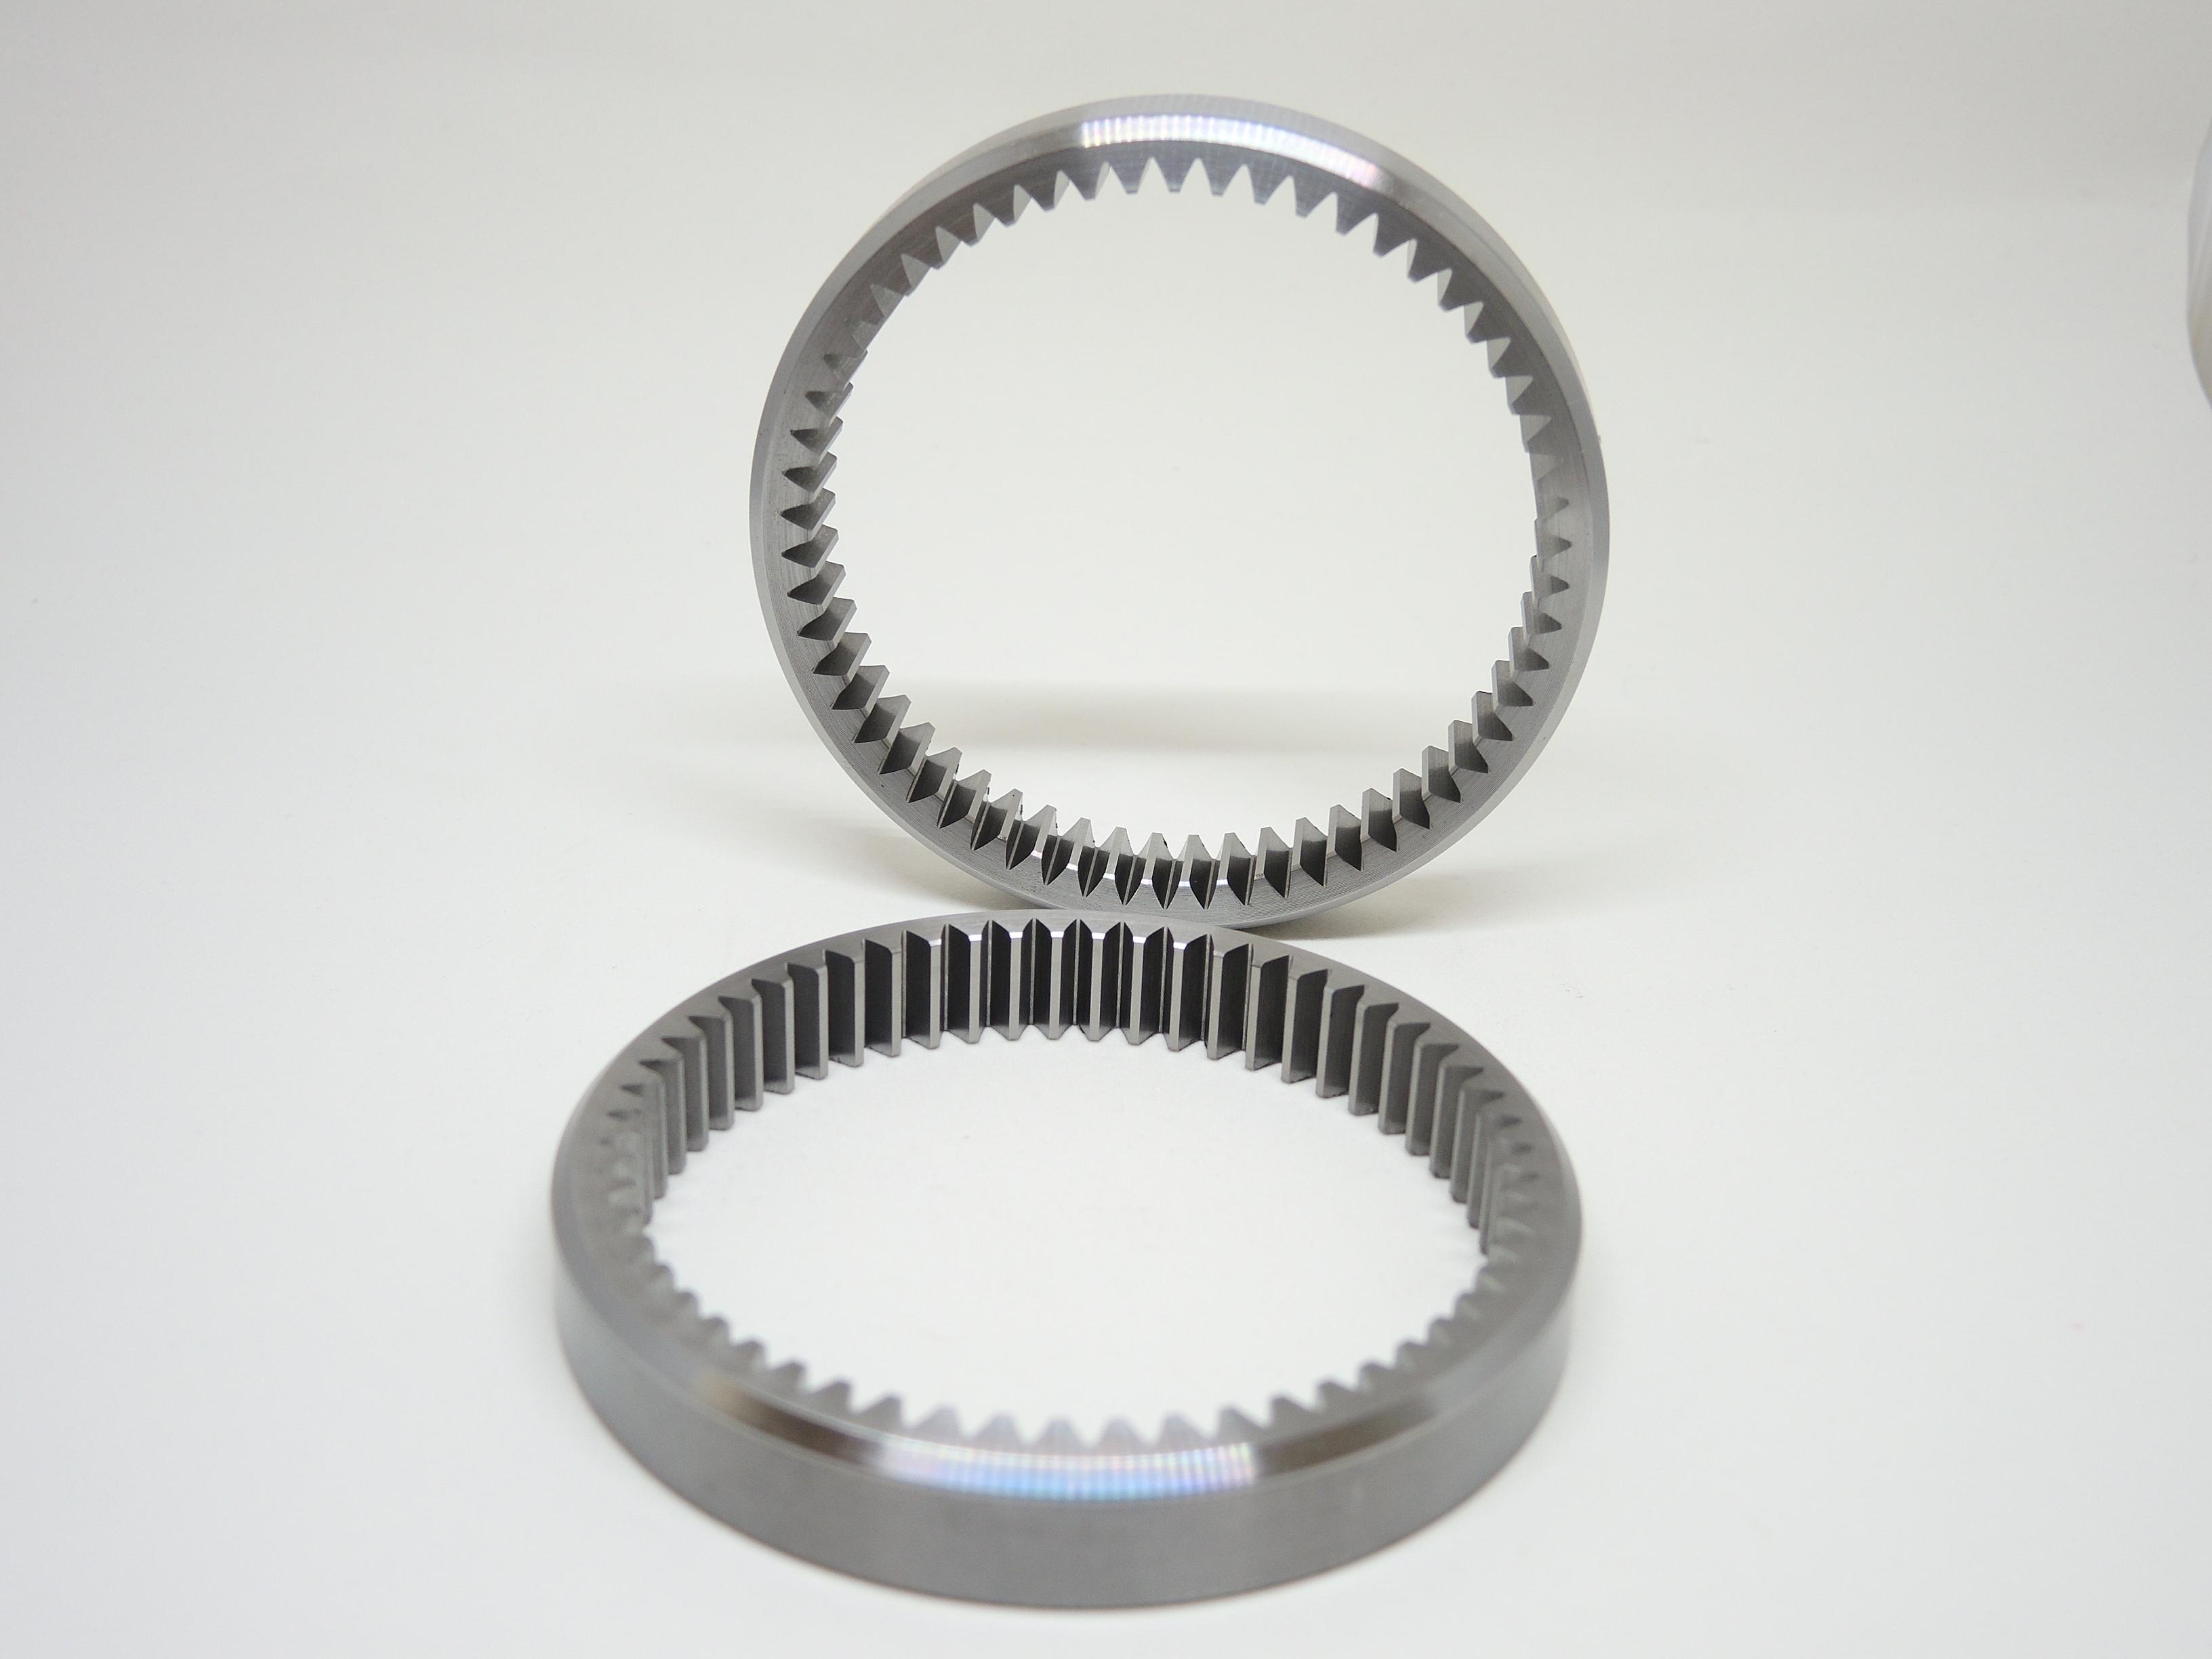 High Precision Standard Customized Steel Internal Gear Ring